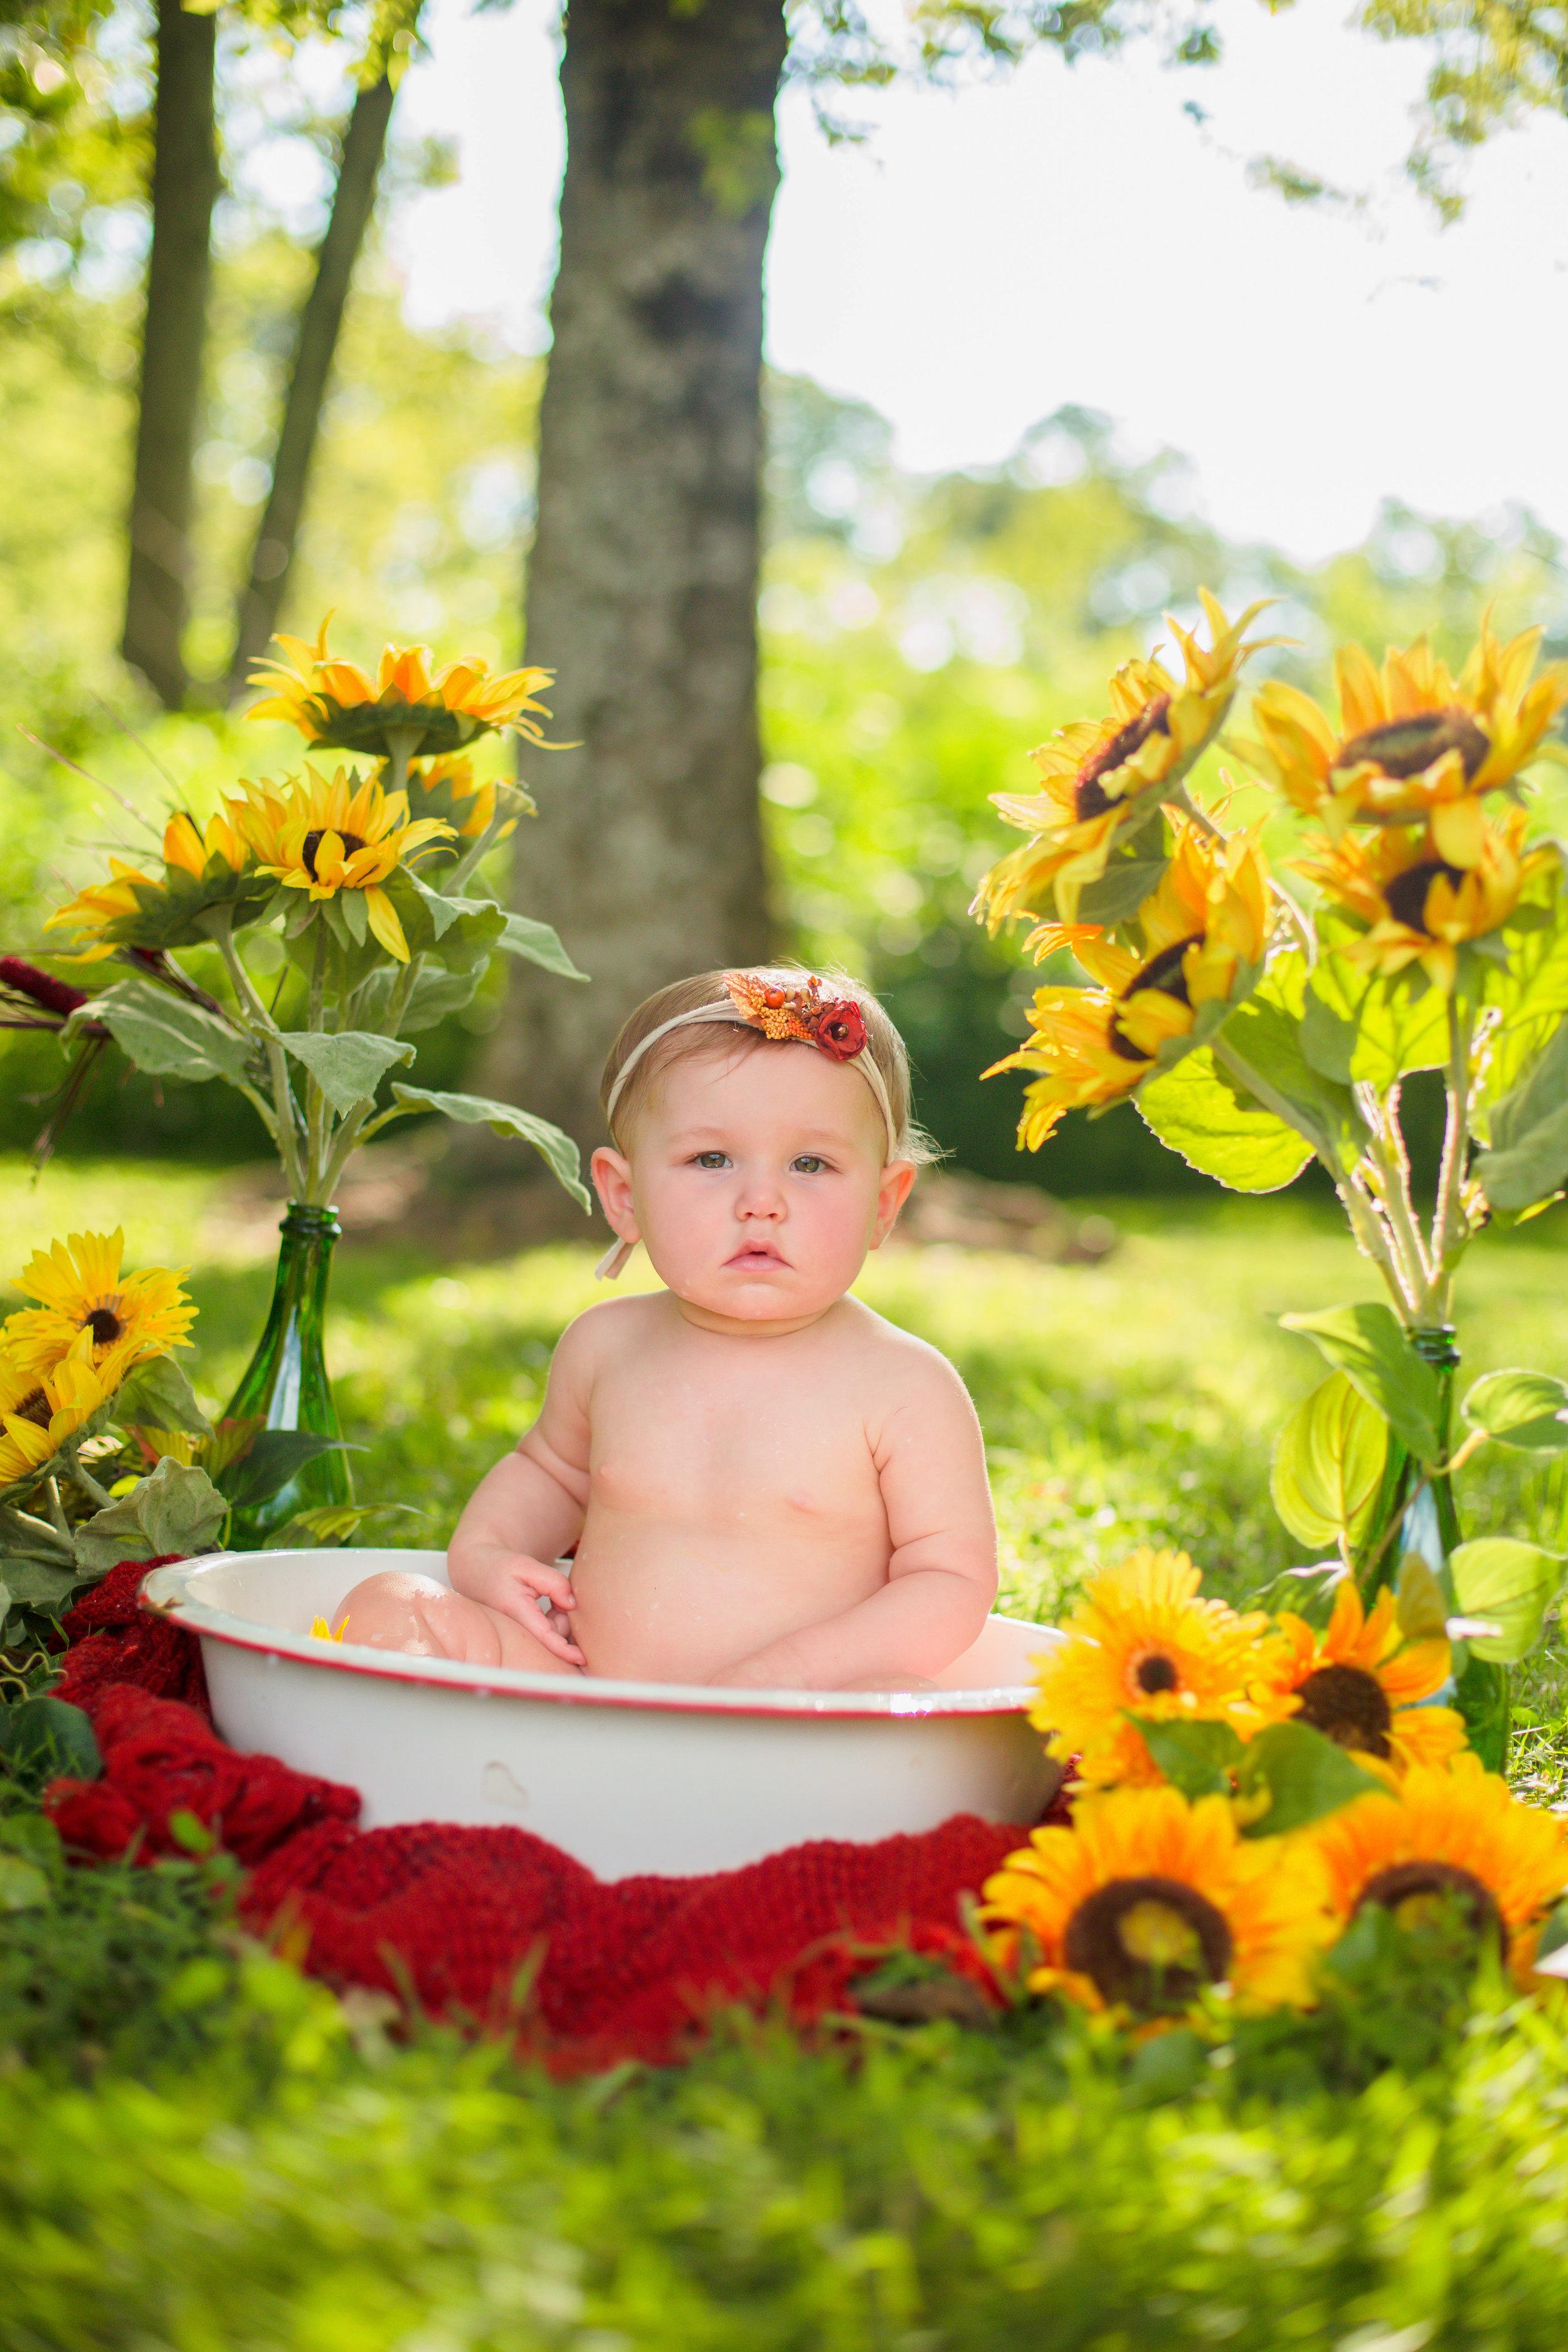 Sawyer-Jo-Sunflower-Milk-bath-Nashville-Family-Photographer-Chelsea-Meadows-Photography-(51).jpg